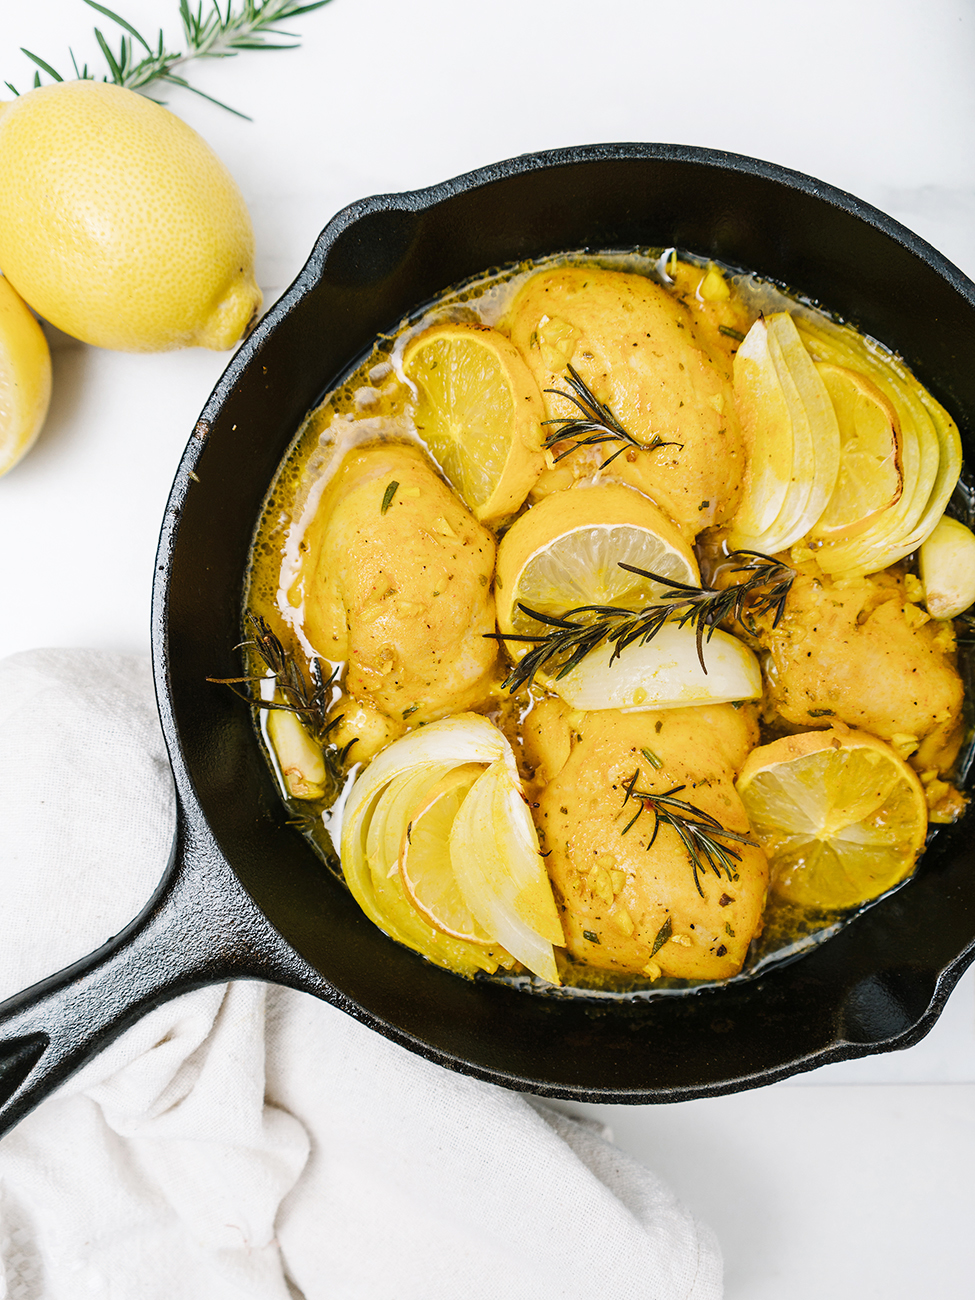 Lemon garlic chicken in a skillet